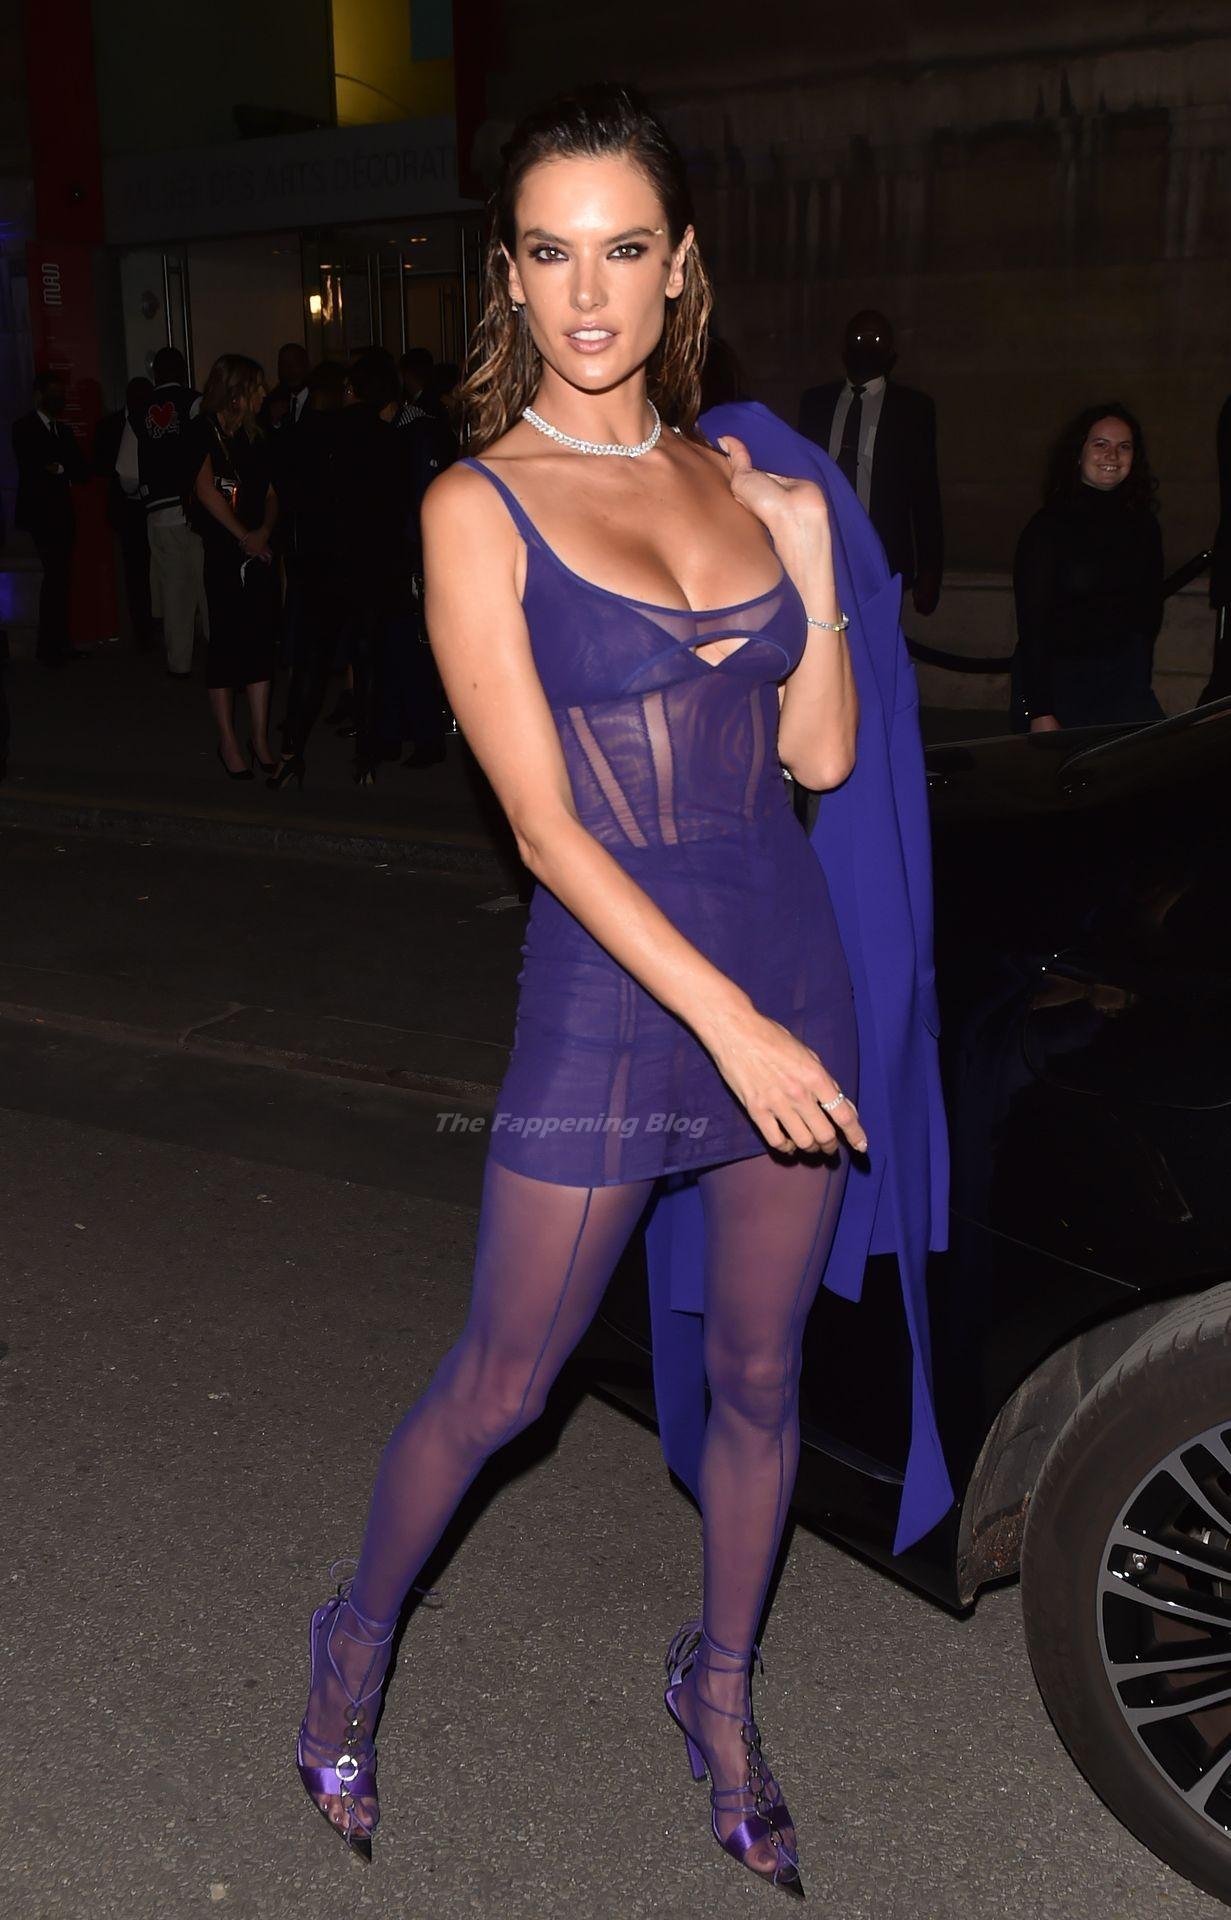 Alessandra-Ambrosio-Sexy-The-Fappening-Blog-83-1.jpg